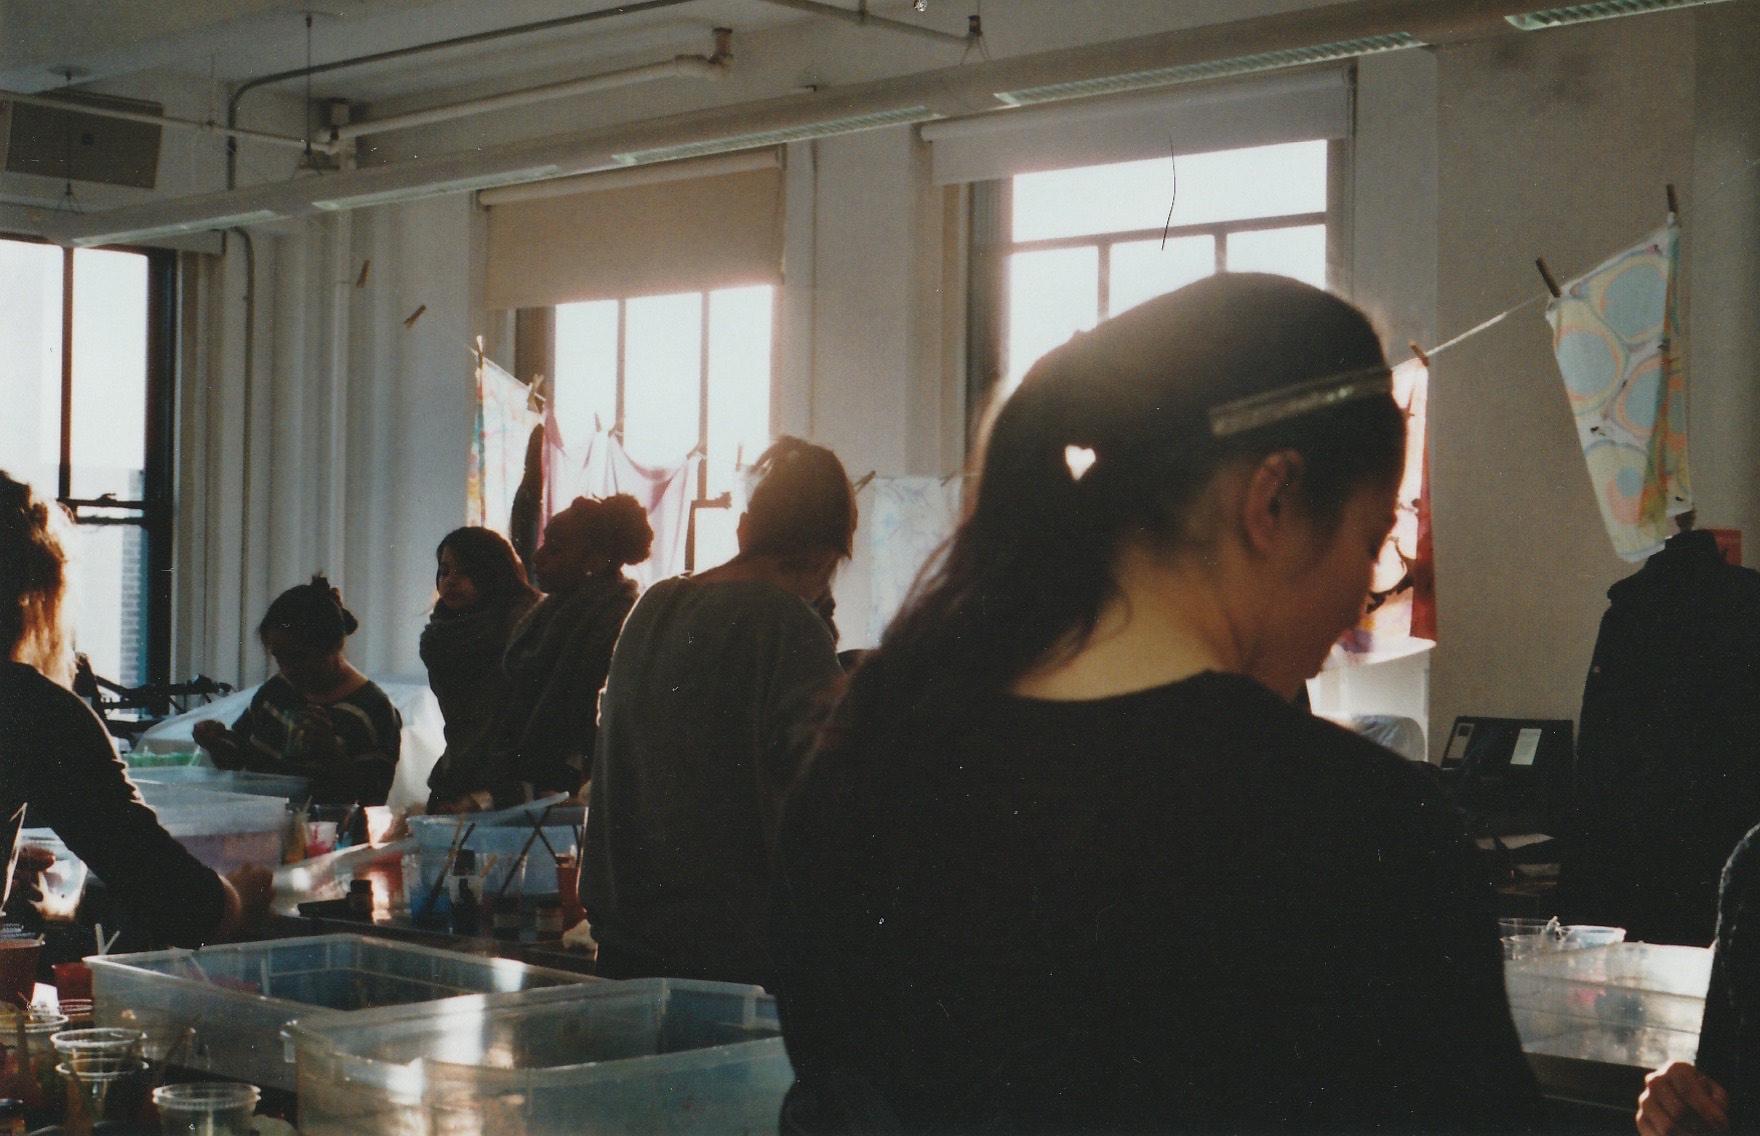 nicole aimee durocher, photo essay, photography, film photography